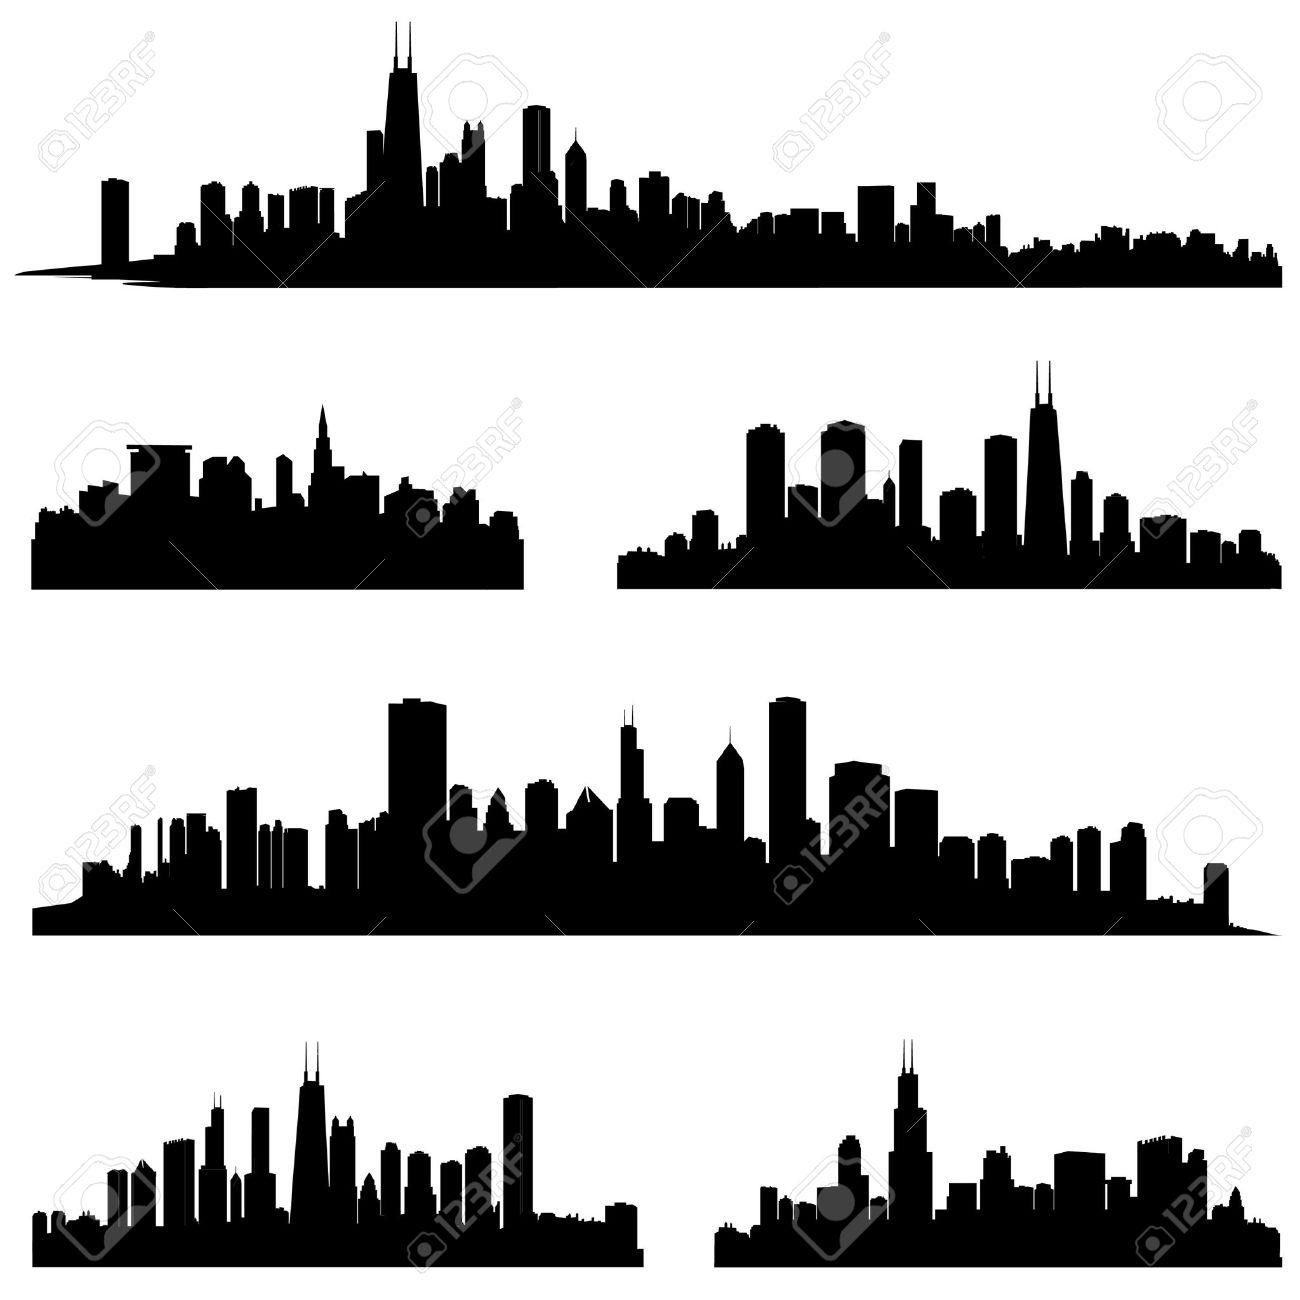 1300x1300 Skyline Clipart City Horizon